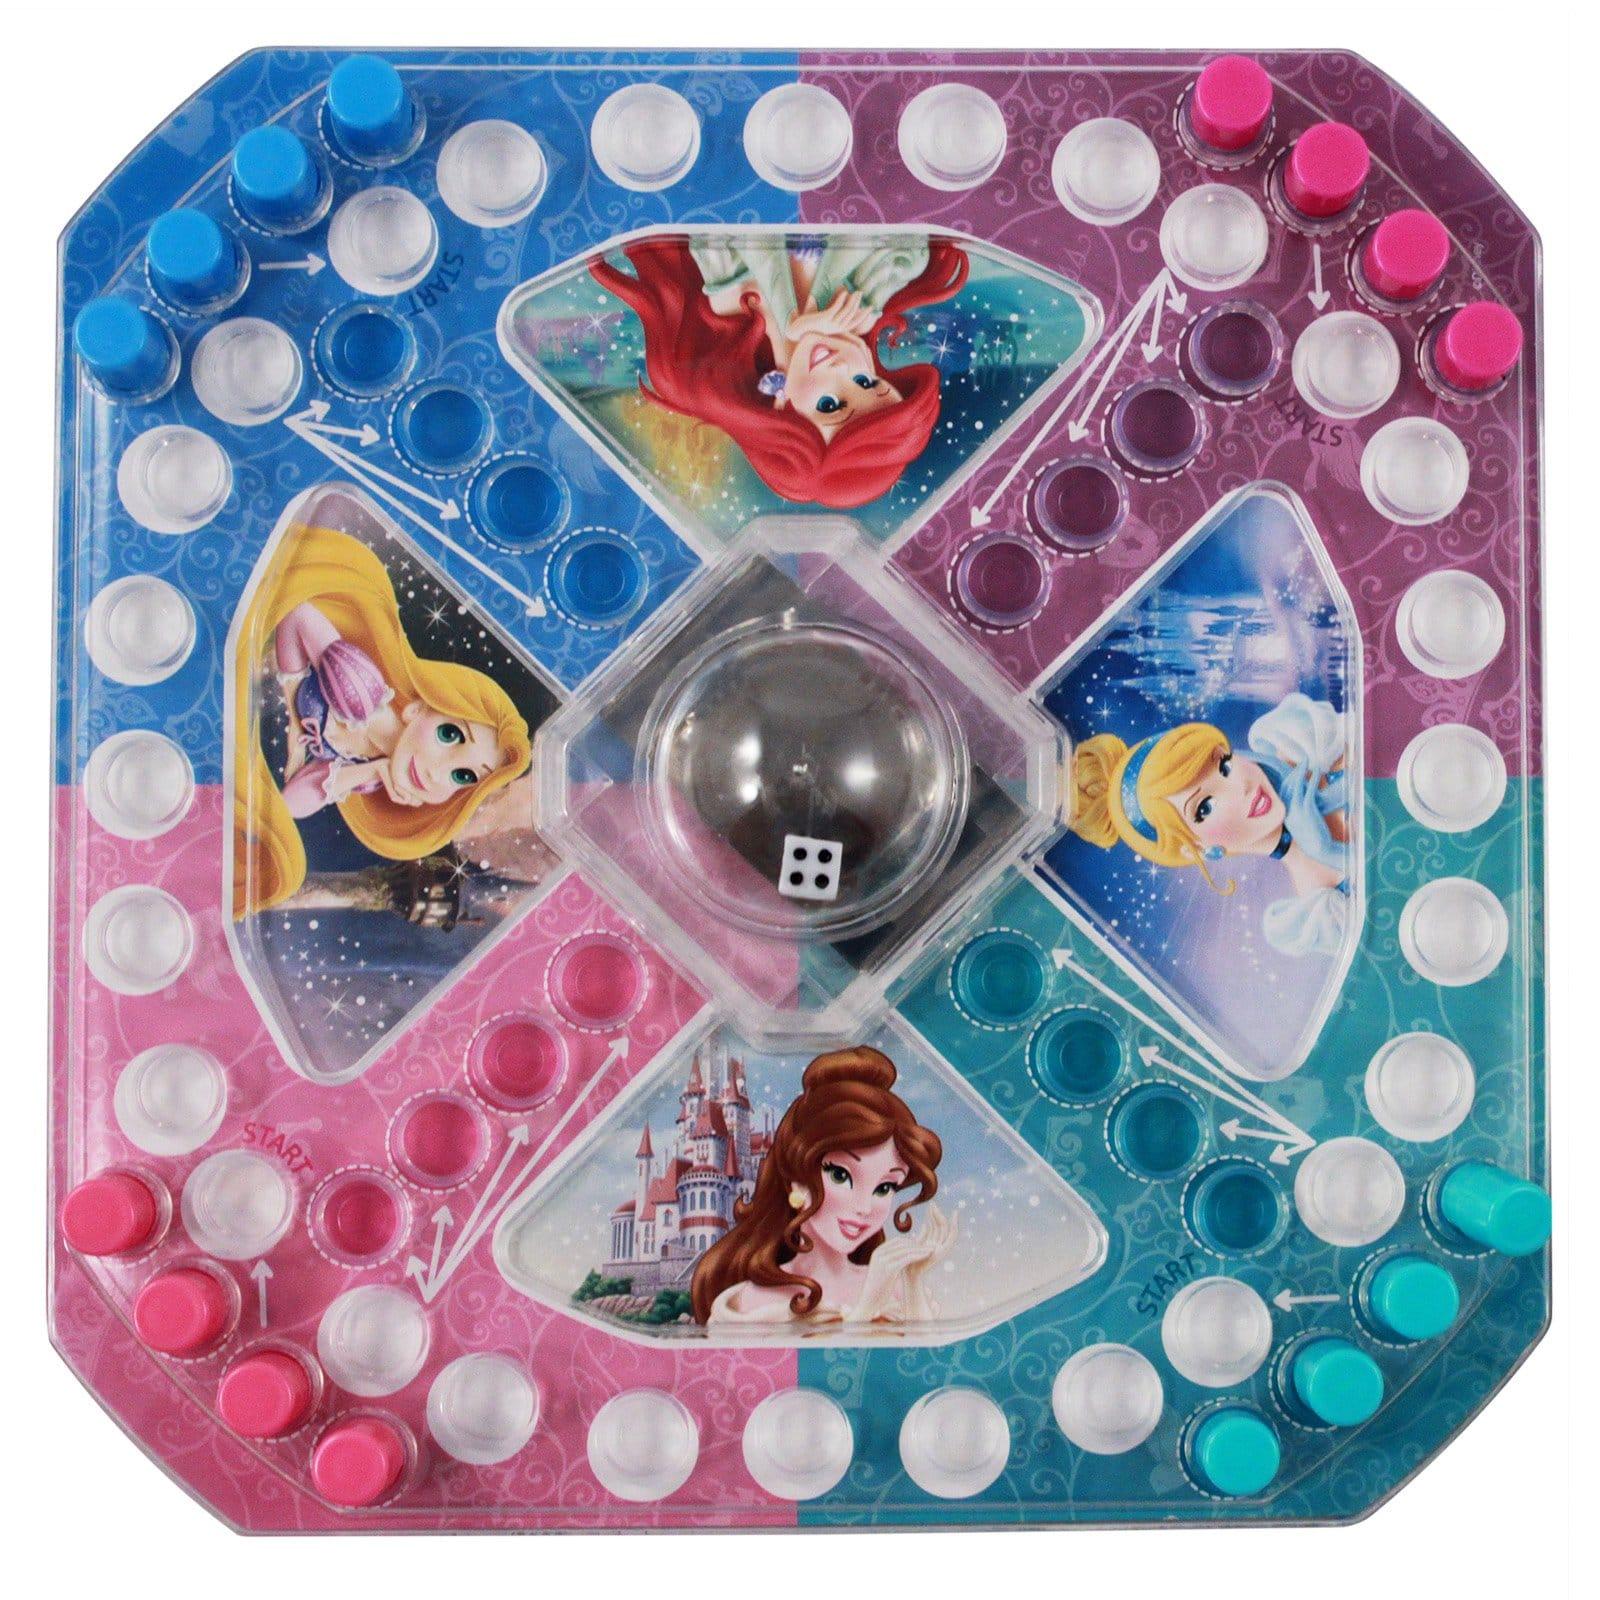 Disney Princess Ariel Rapunzel Belle Cinderella Race to the Palace Pop Up Game